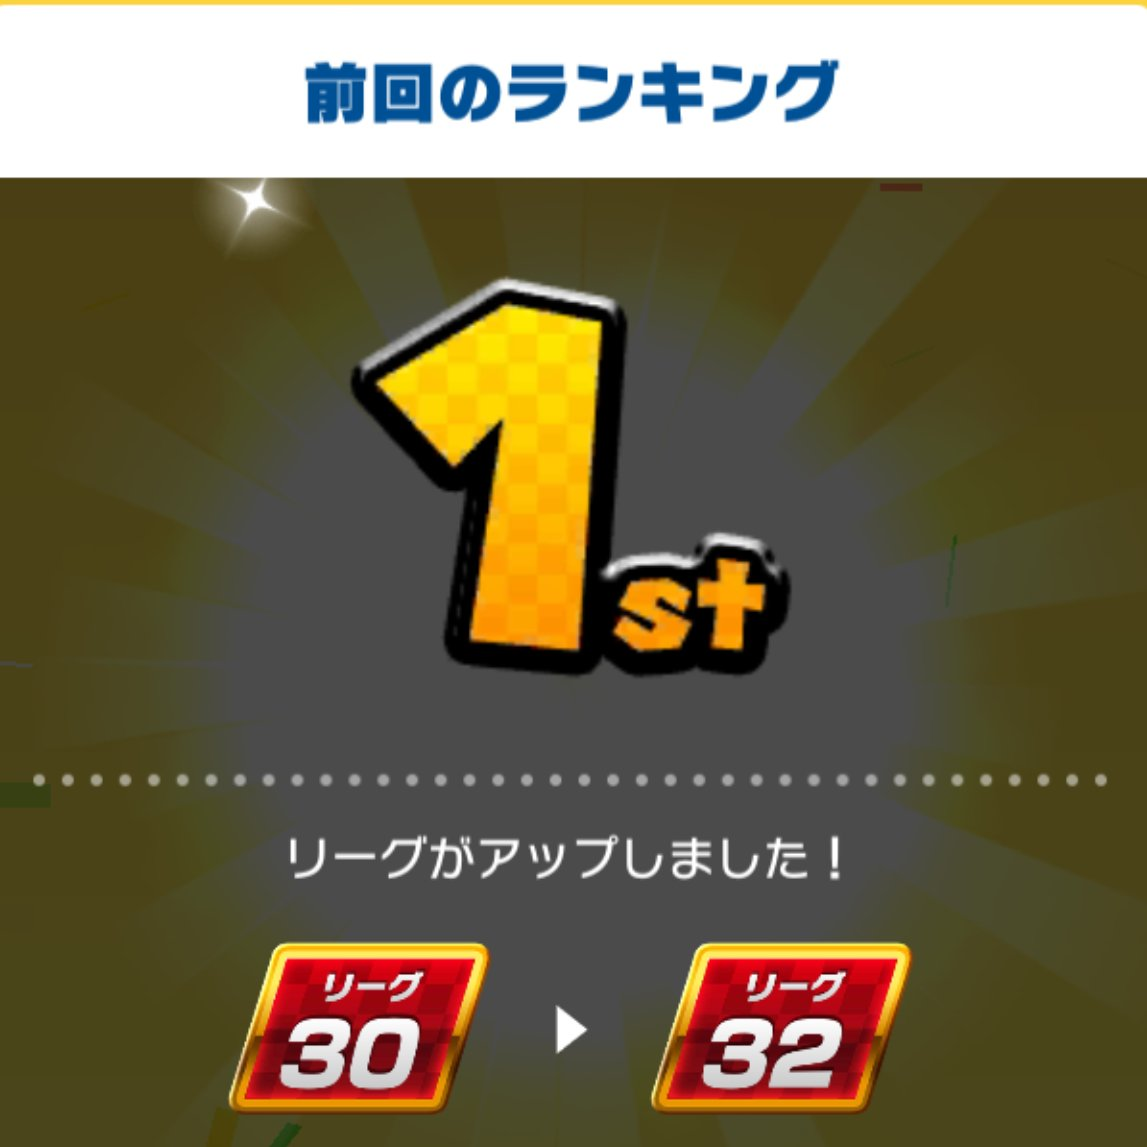 test ツイッターメディア - キエー!!( ゚Д゚) #マリオカートツアー #マリオカート #任天堂 #Nintendo https://t.co/YZ4jP3loWZ